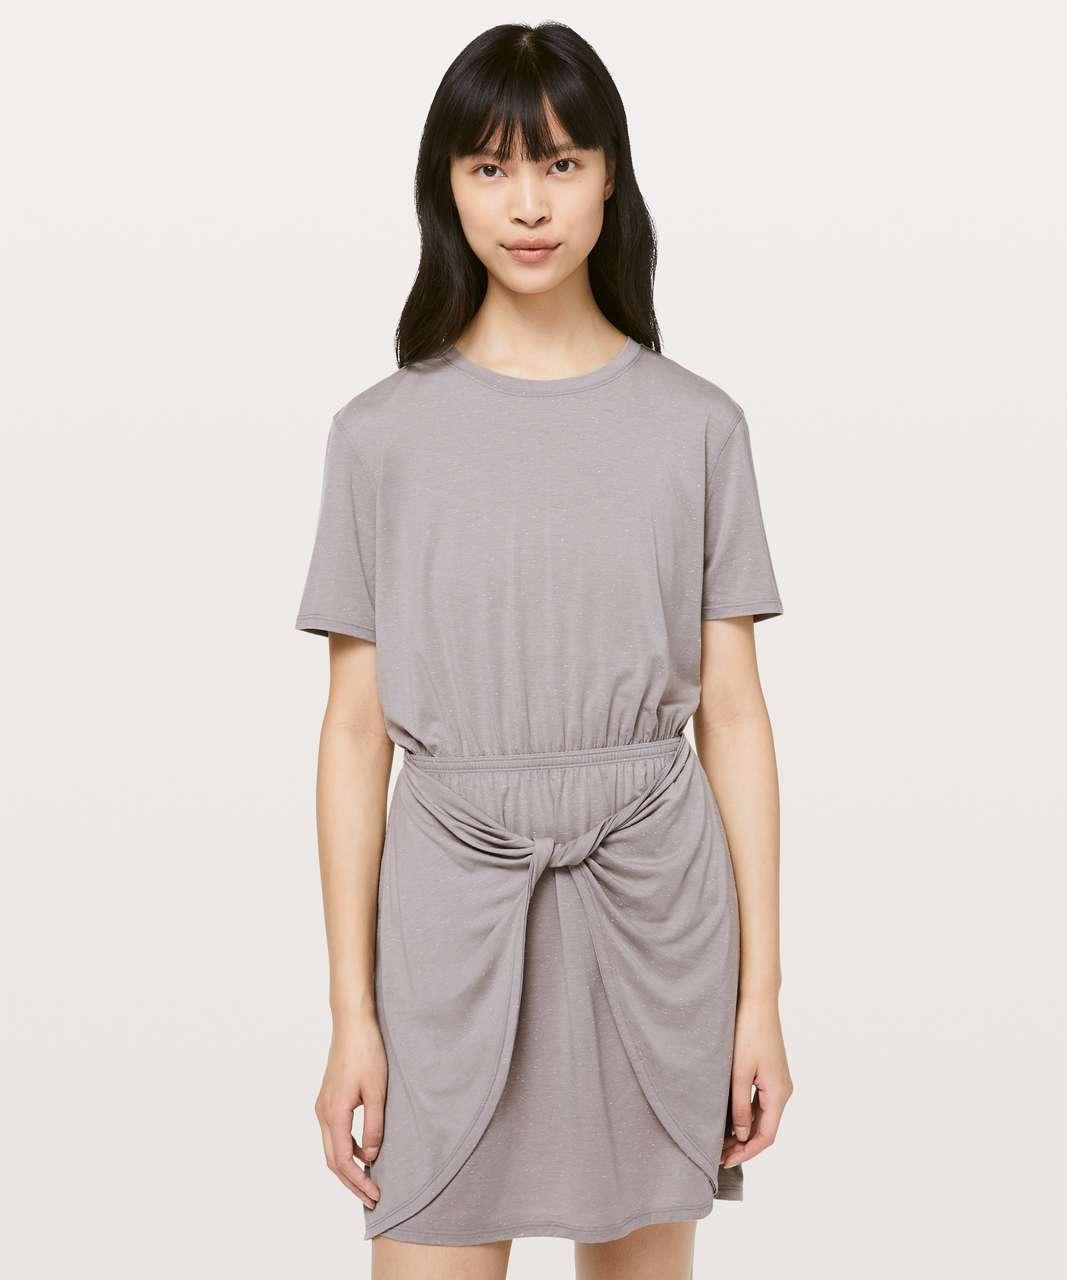 Lululemon Unwind Your Mind Dress - Dark Chrome / White